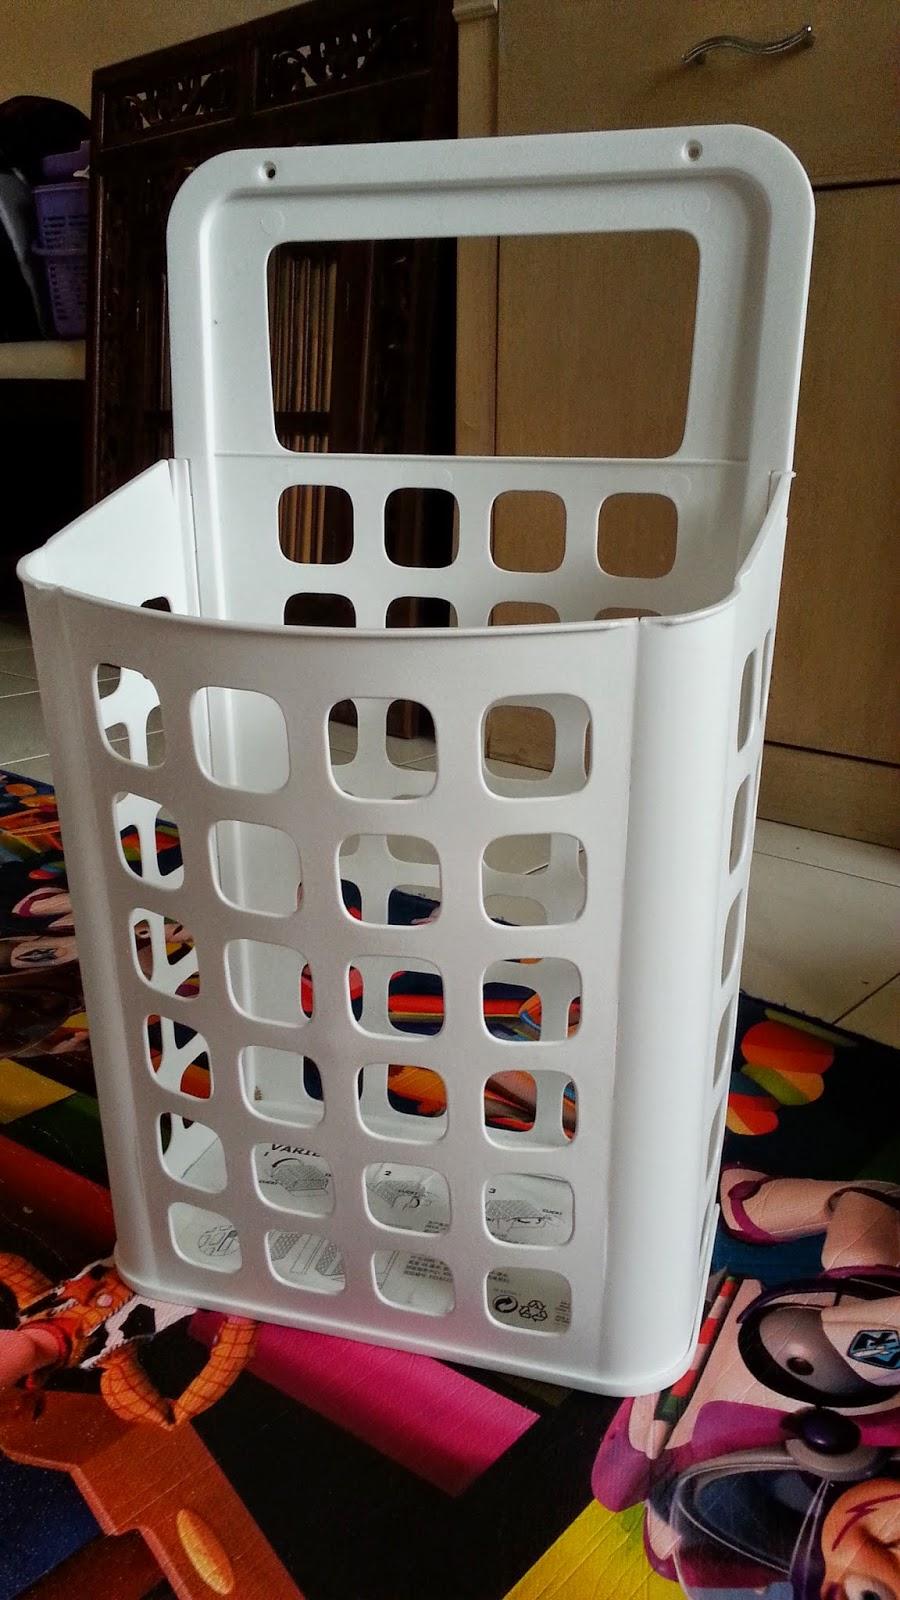 syafisyifa 39 susun atur beg kertas beg plastik. Black Bedroom Furniture Sets. Home Design Ideas